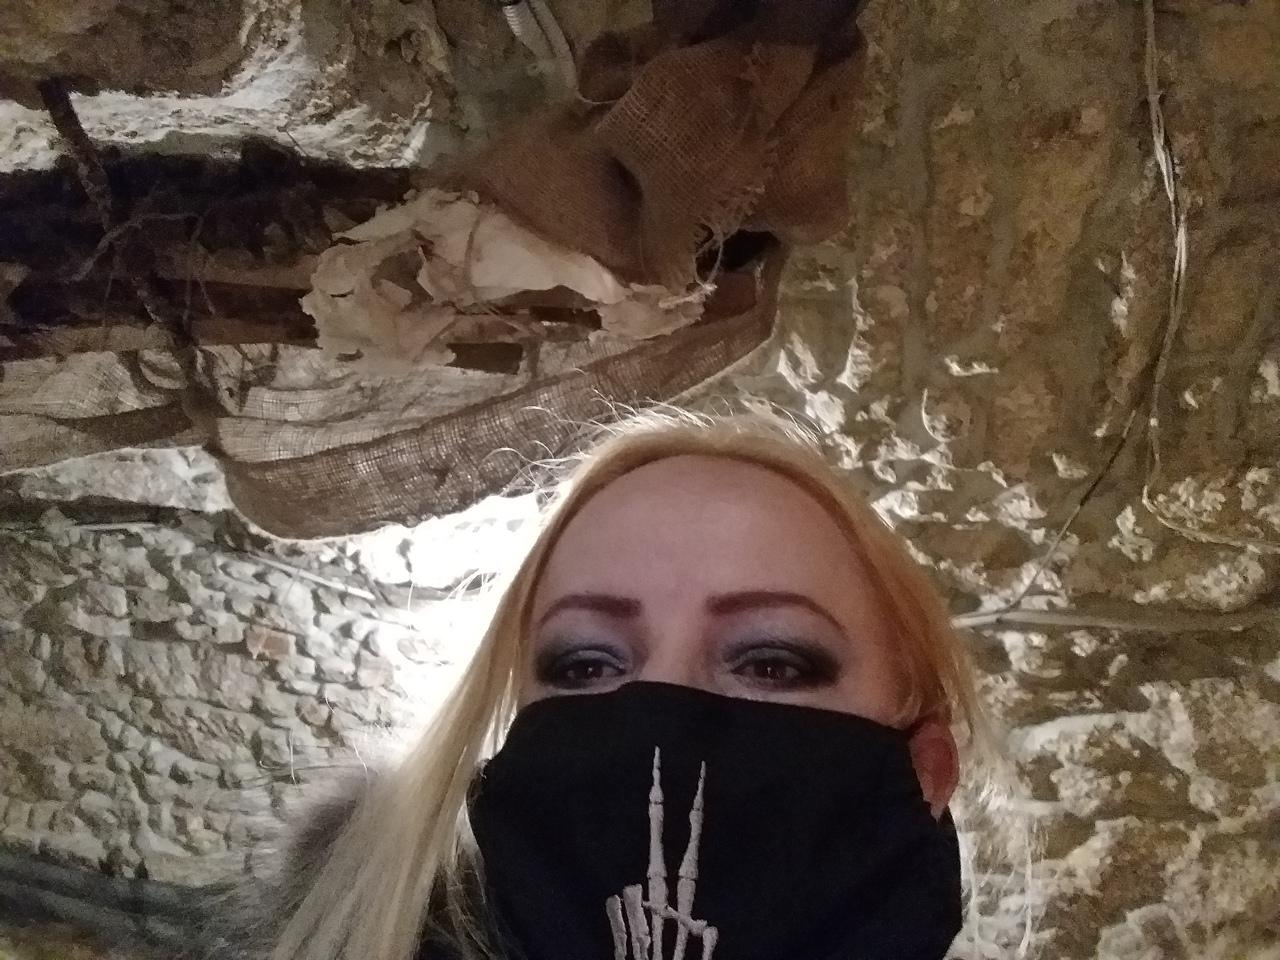 перелет - Елена Руденко. Мои путешествия (фото/видео) - Страница 4 NLKNqJcOQNU